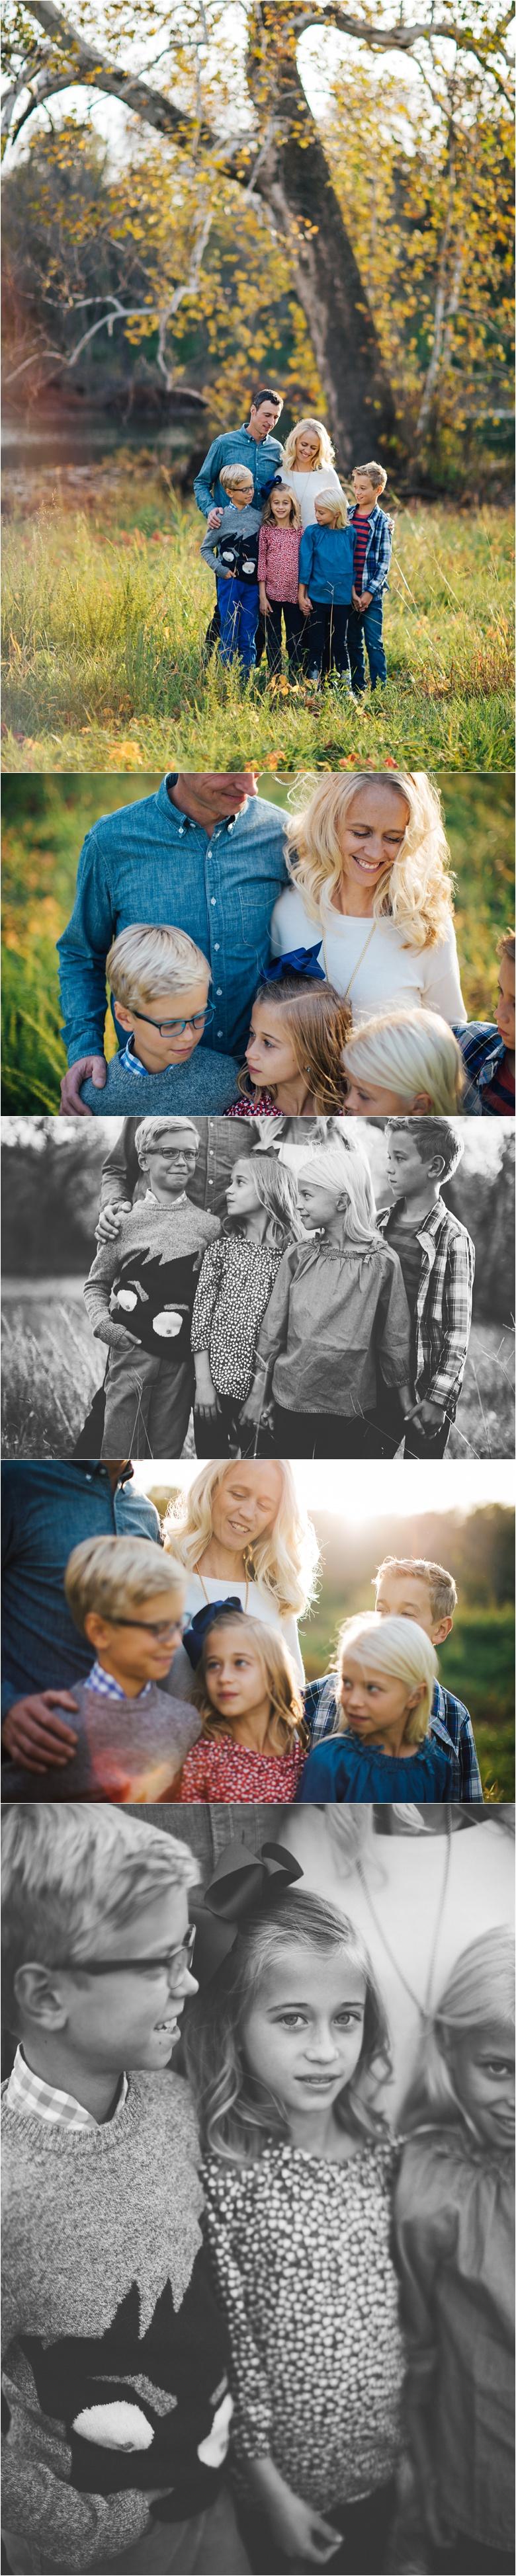 kansascityfamilyphotographer_2002